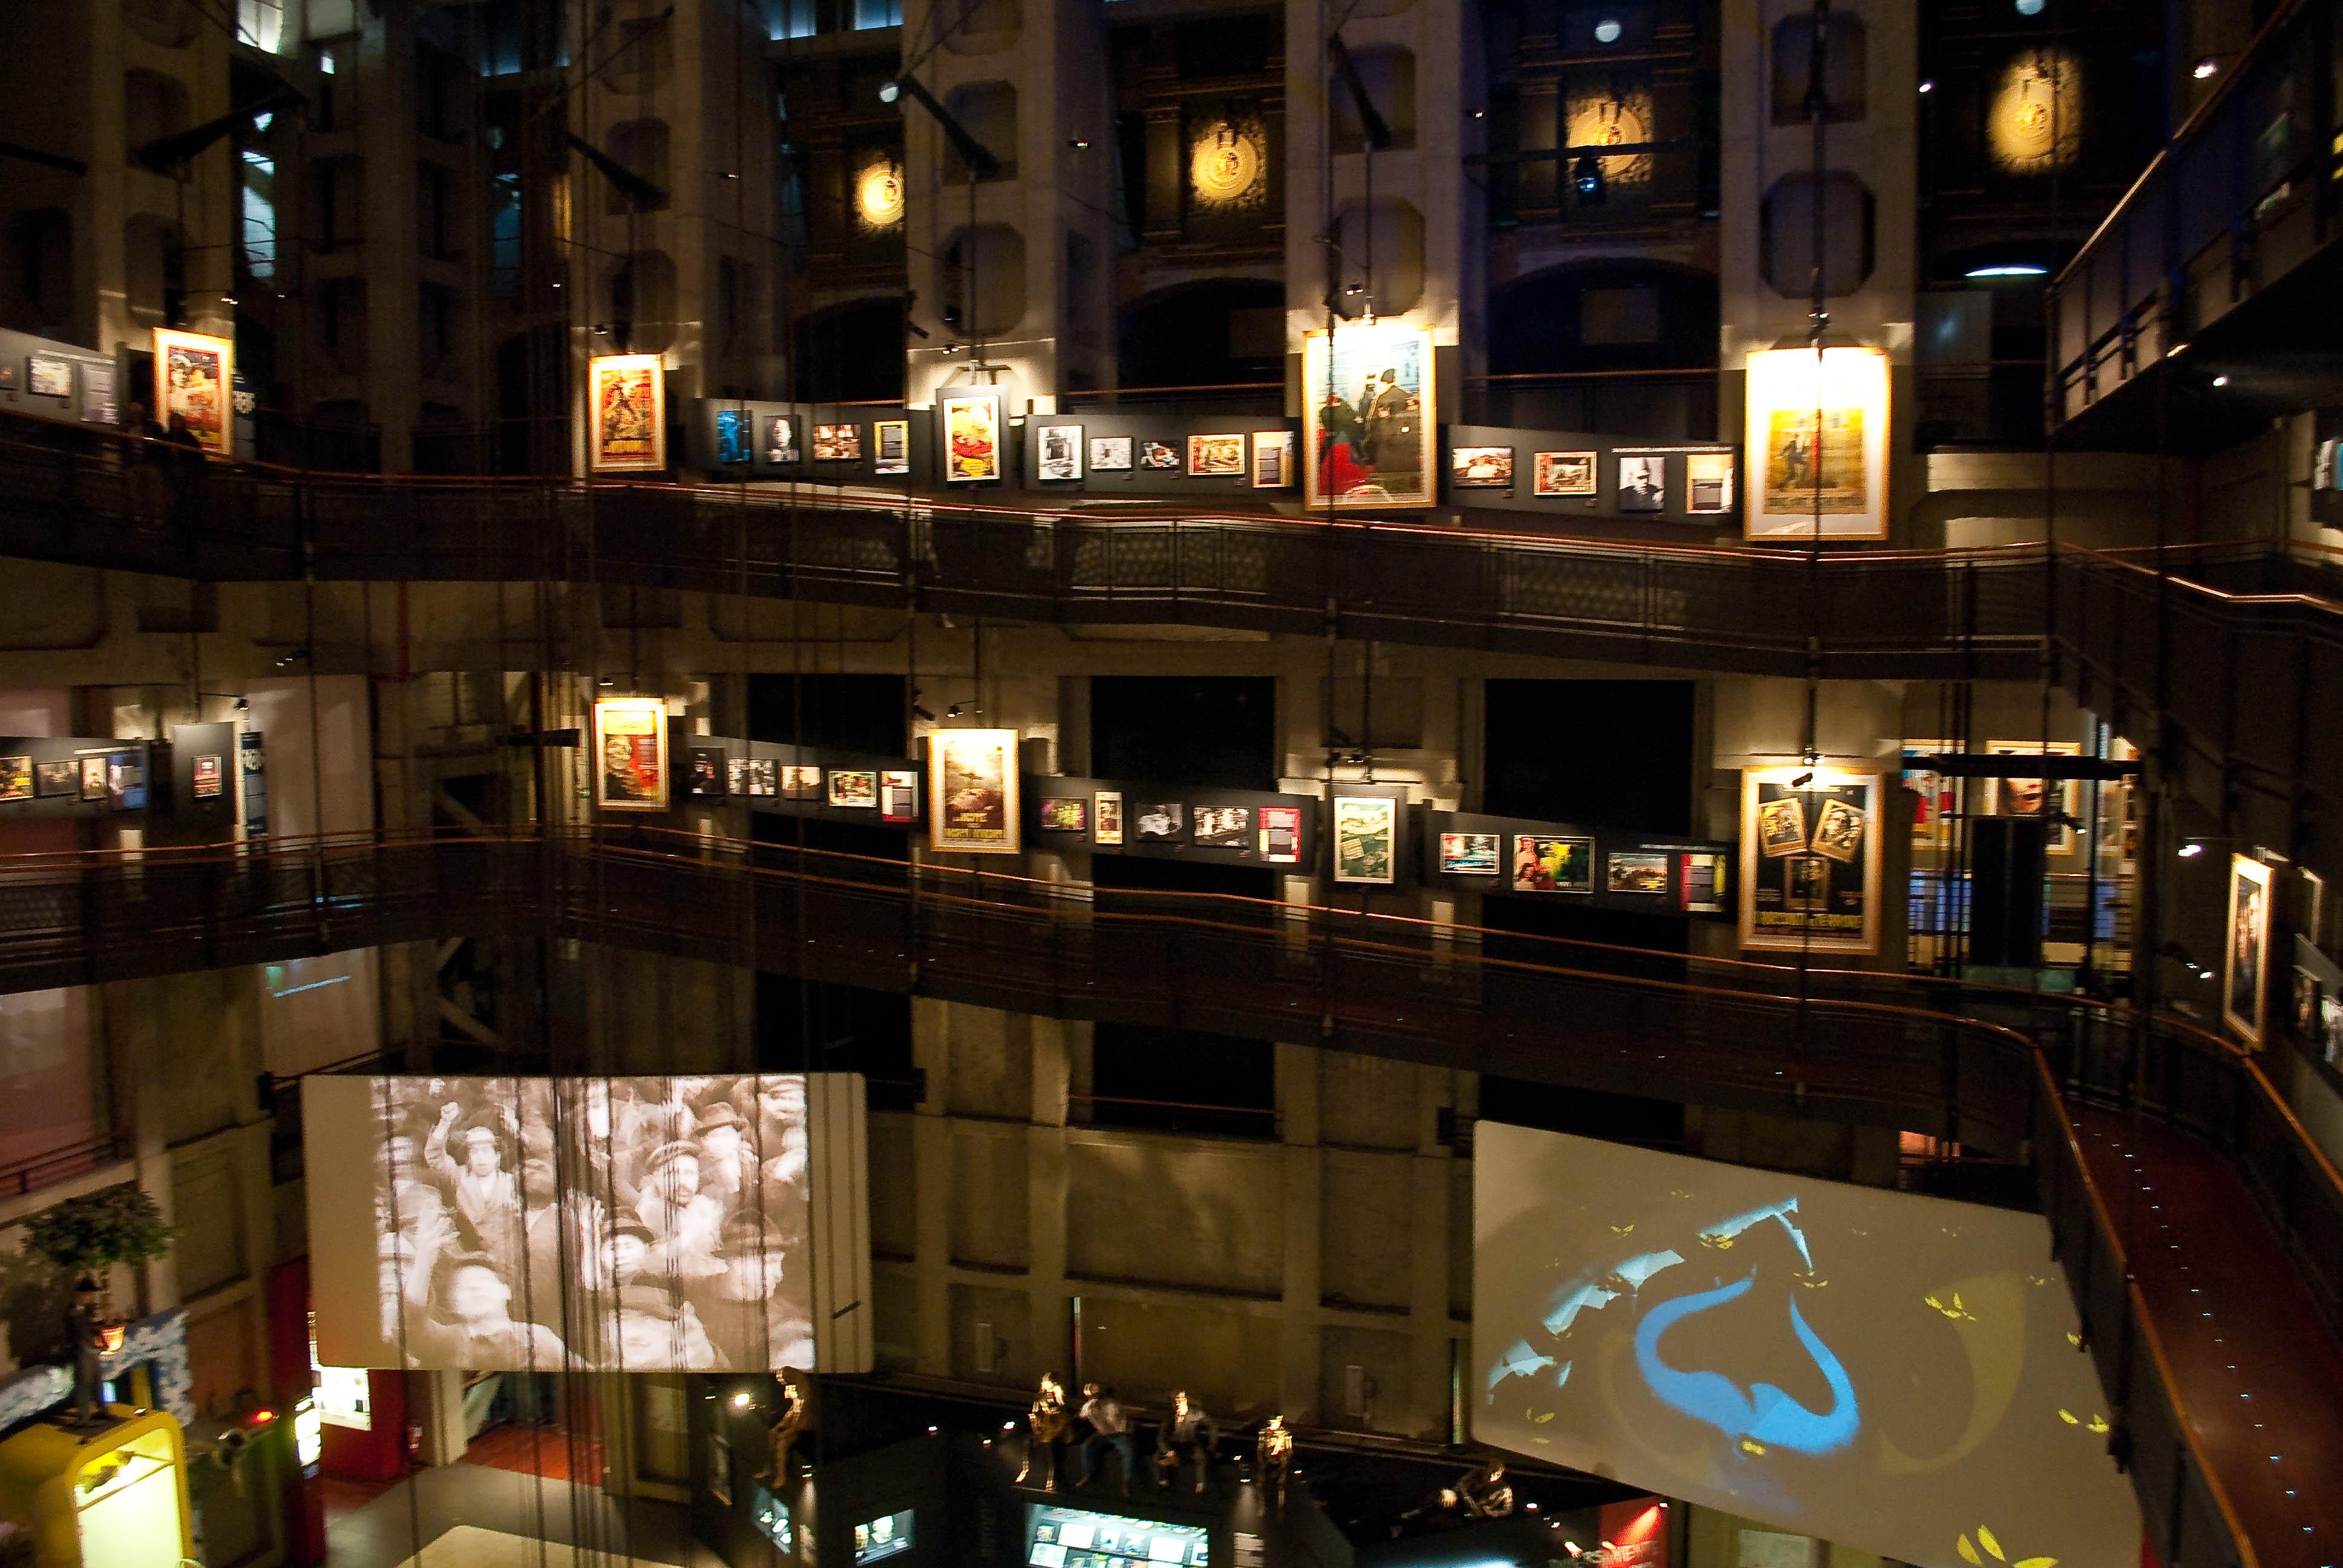 Museo del cine - 4 9